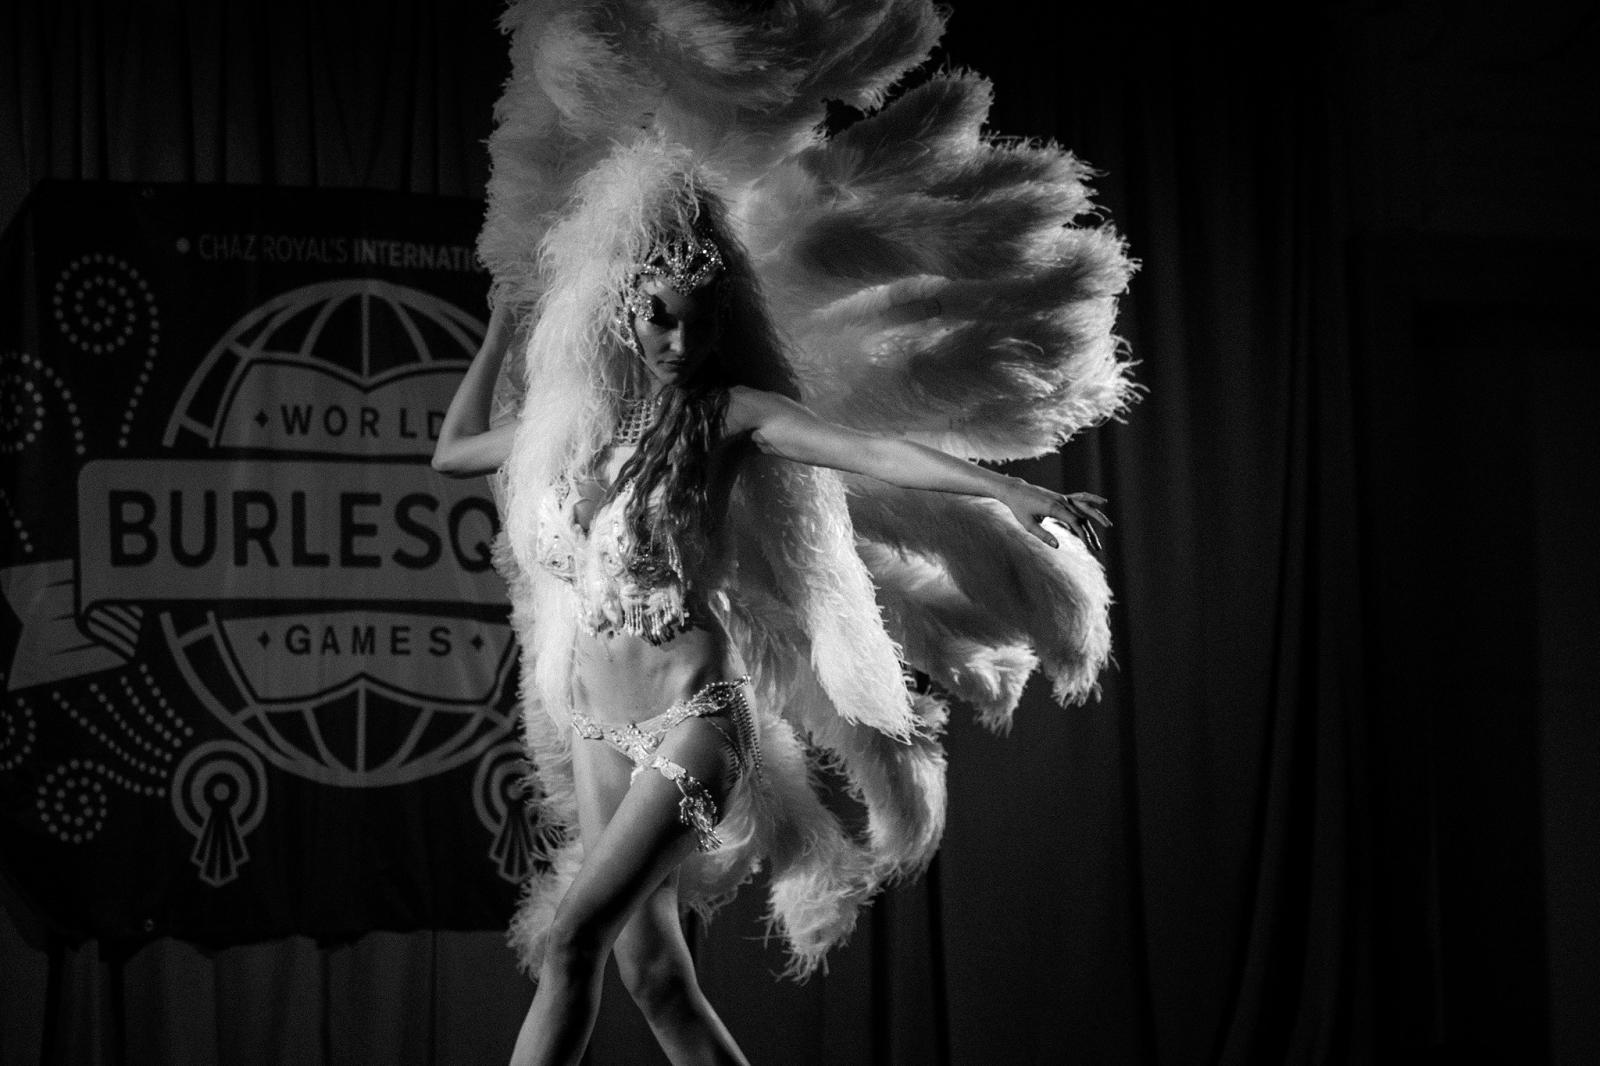 Chaz Royal presents World Burlesque Games: World Crown & World Alternative Crown